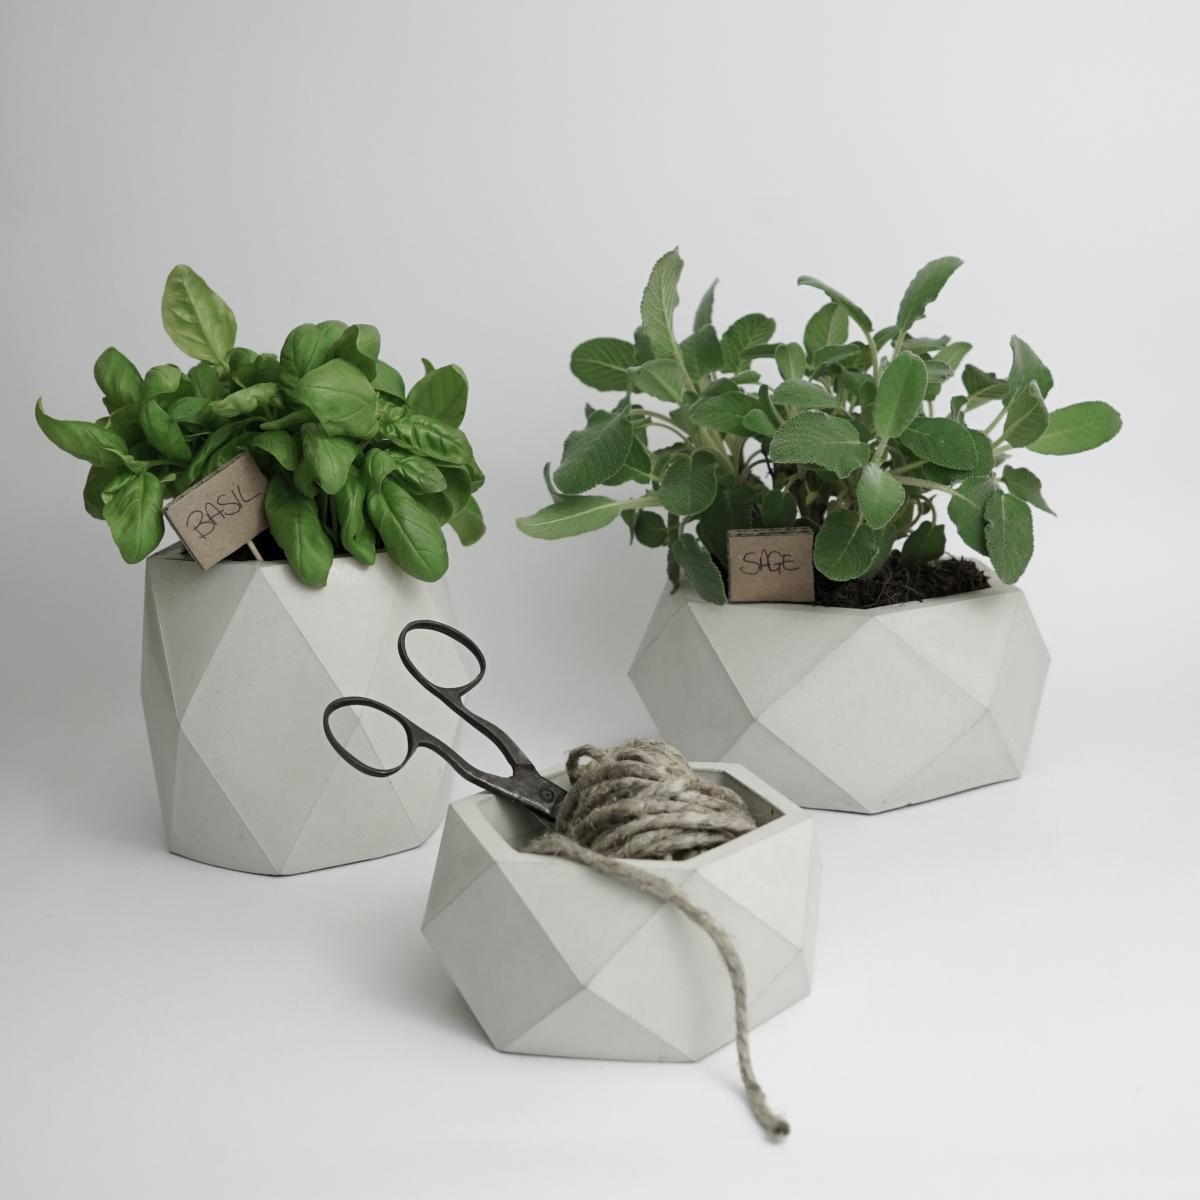 Vasi moderni da interno vasi in cemento ore set 3 for Vasi moderni da interno